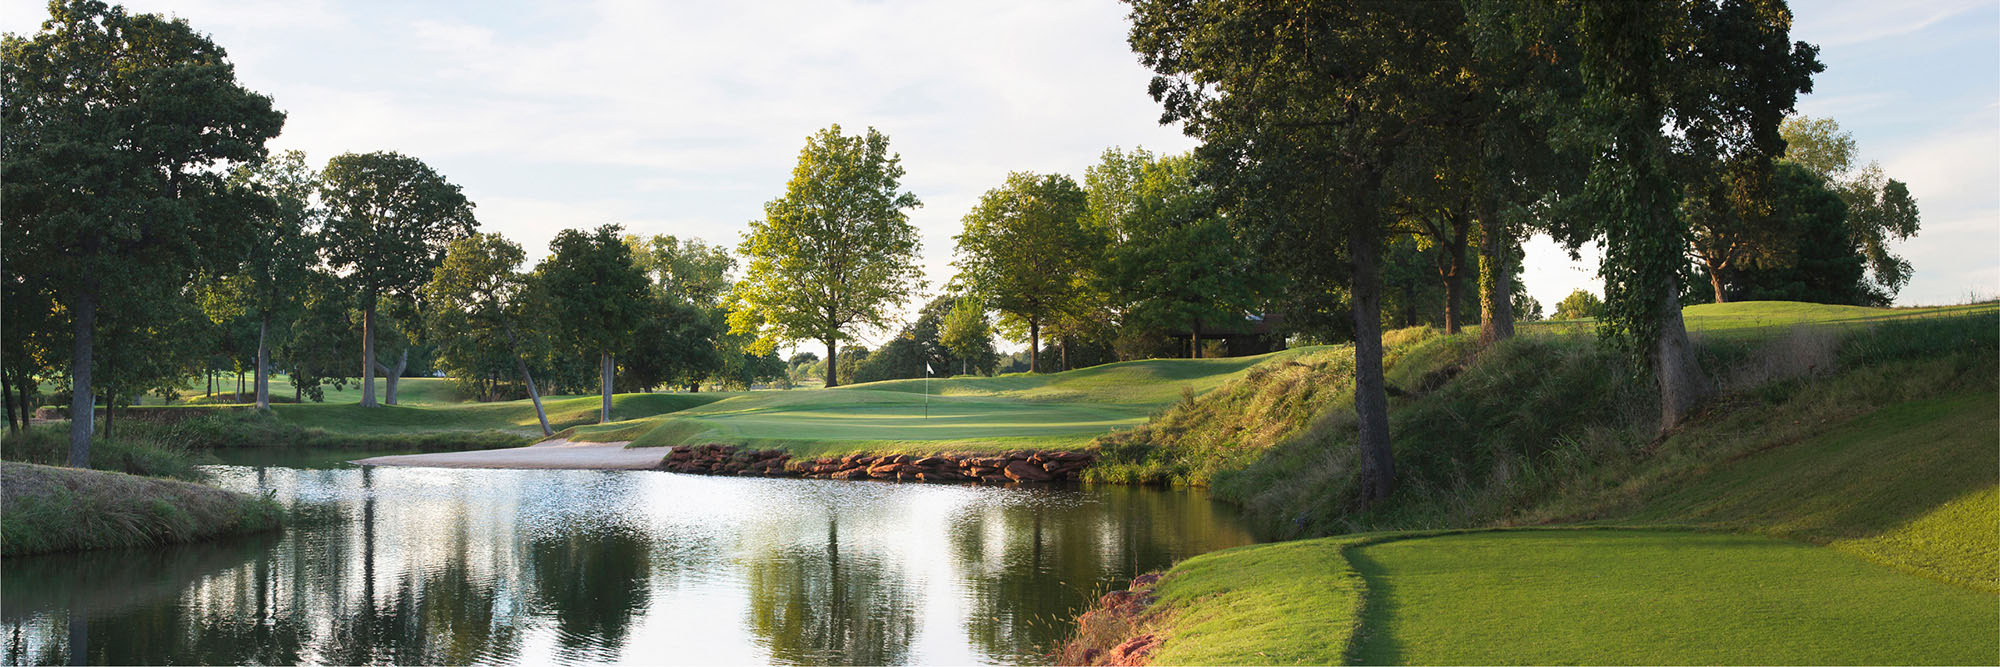 Golf Course Image - Oak Tree National No. 4